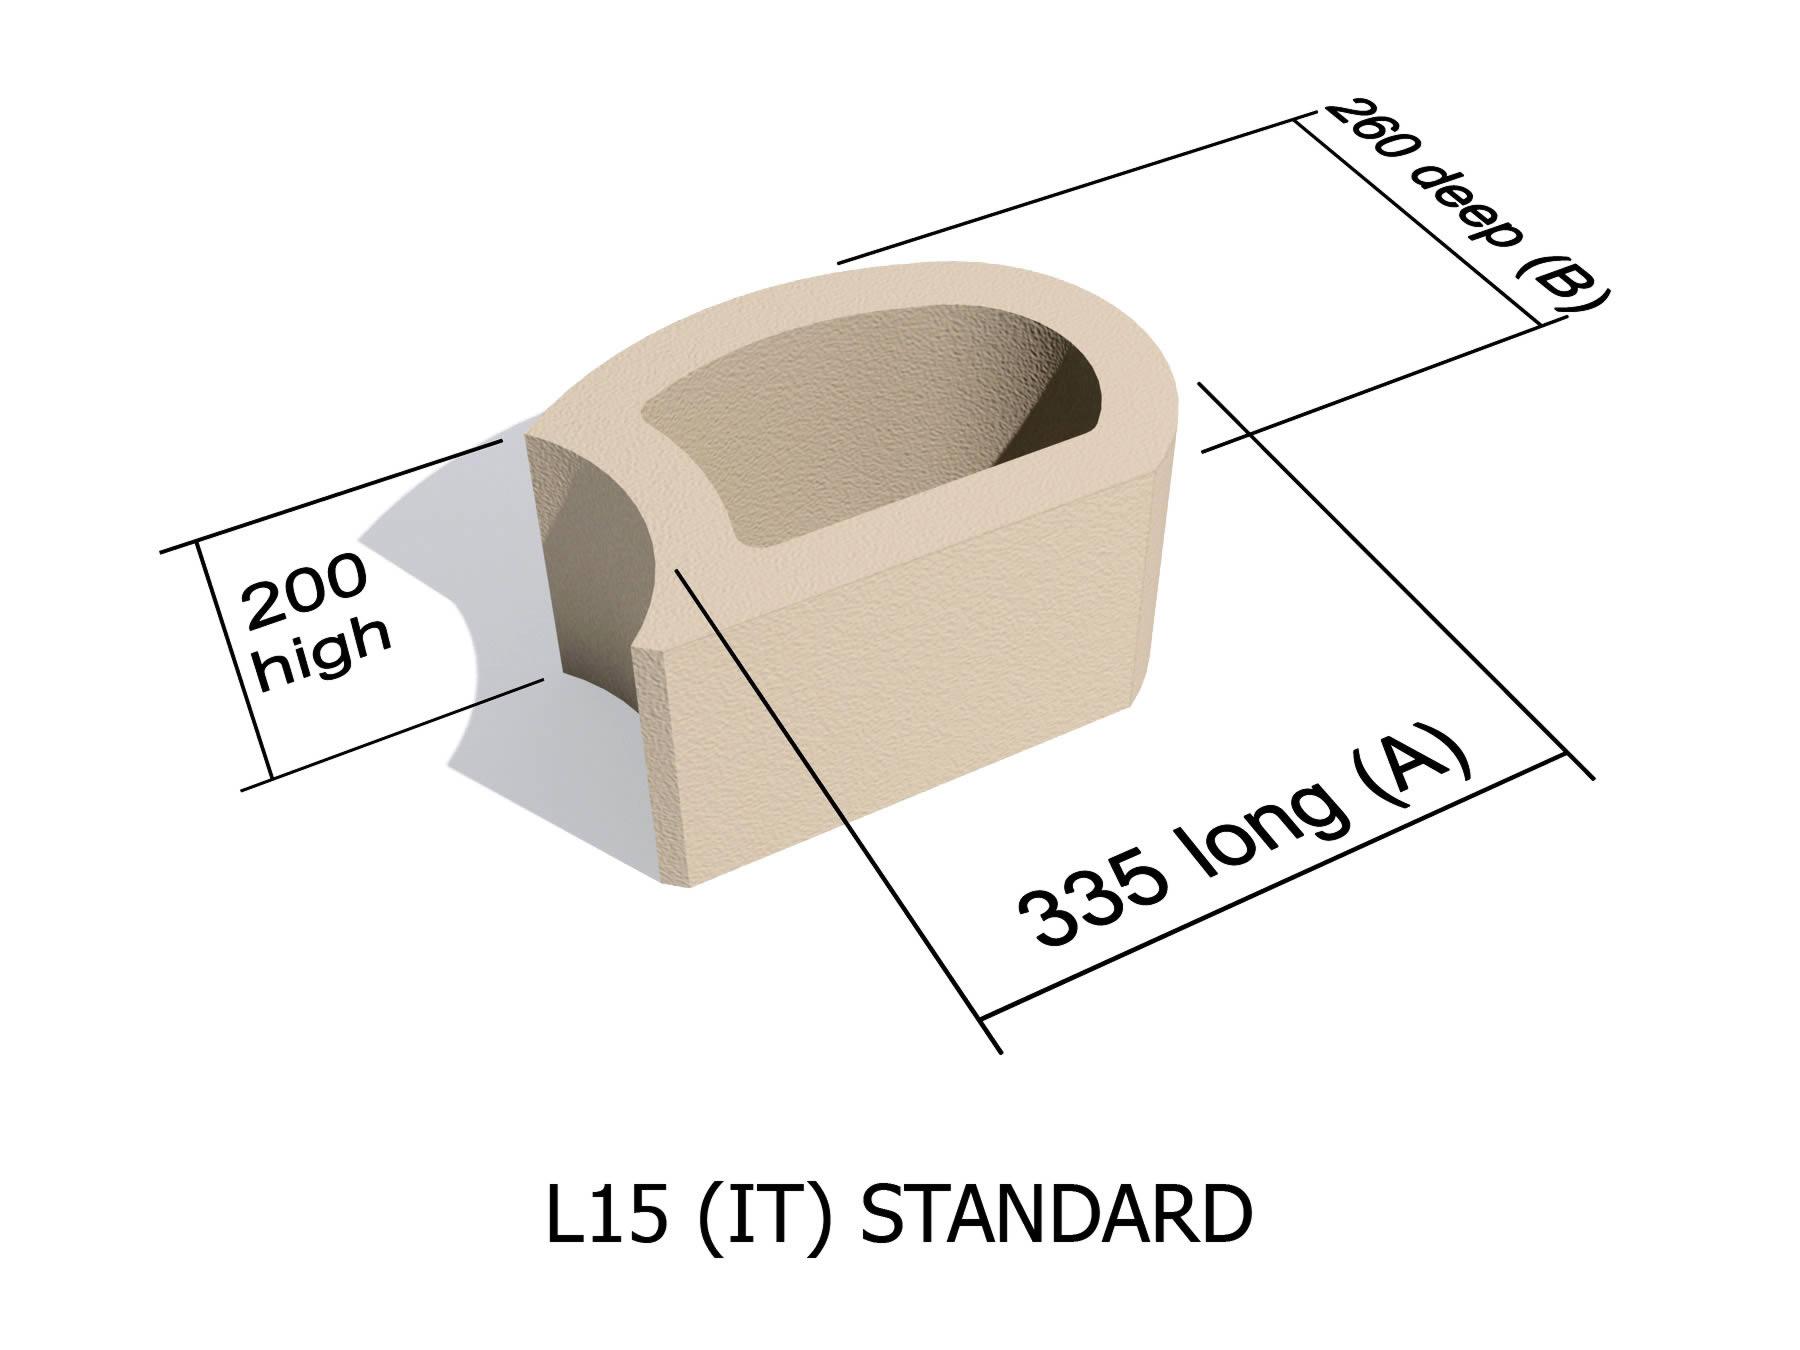 L15_IT smooth face retaining block